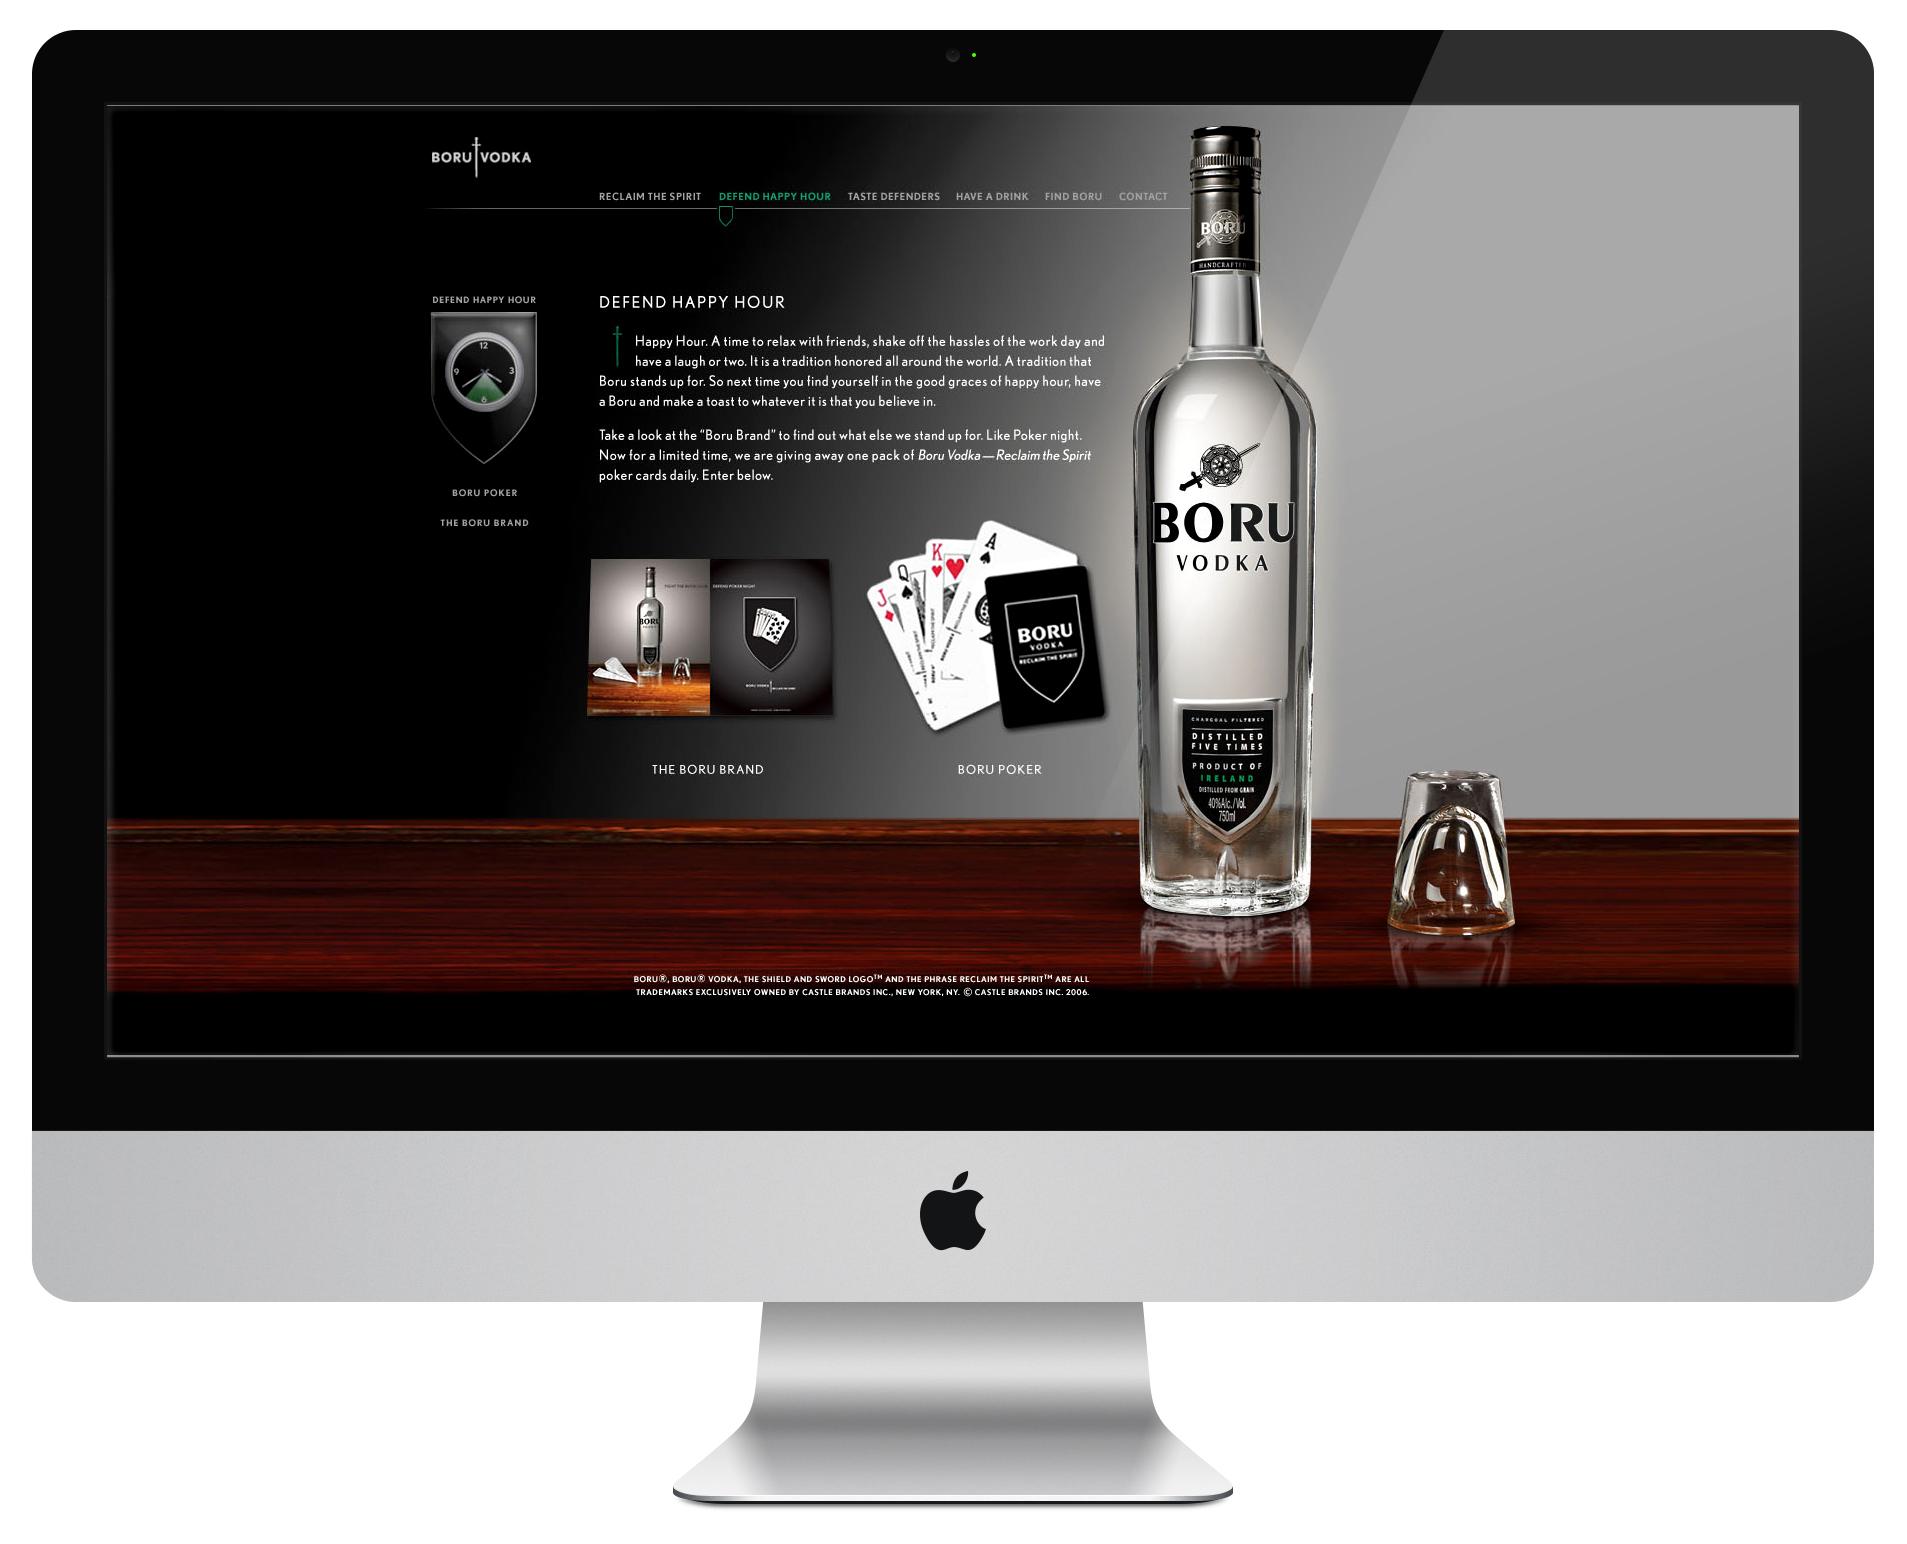 Boru_iMac Frame_HomePage2.jpg